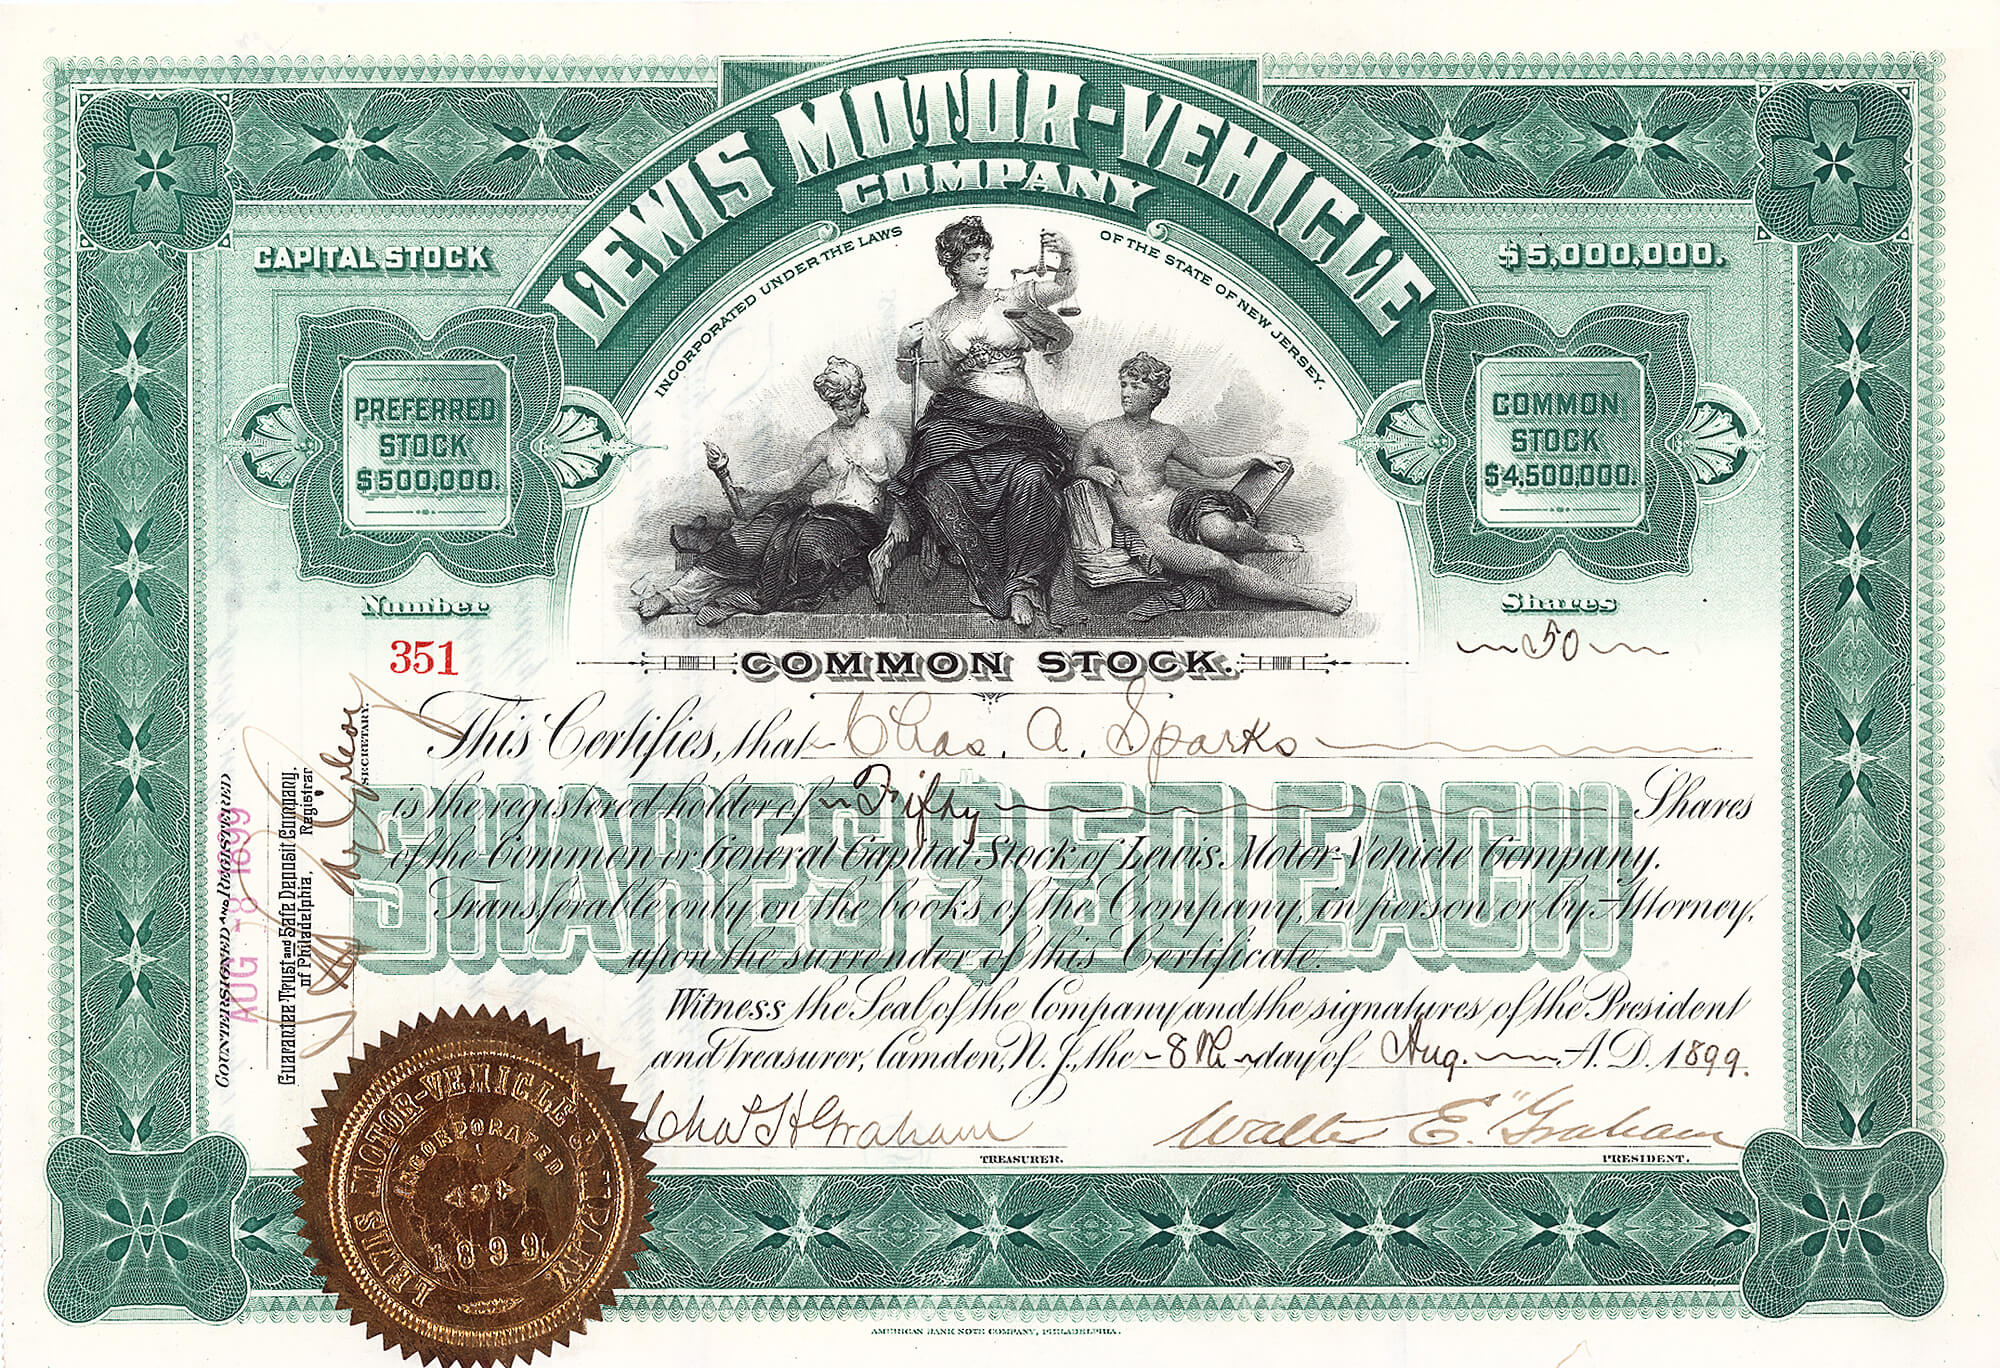 Lewis Motor Vehicle Company Camden New Jersey Aktie 1899